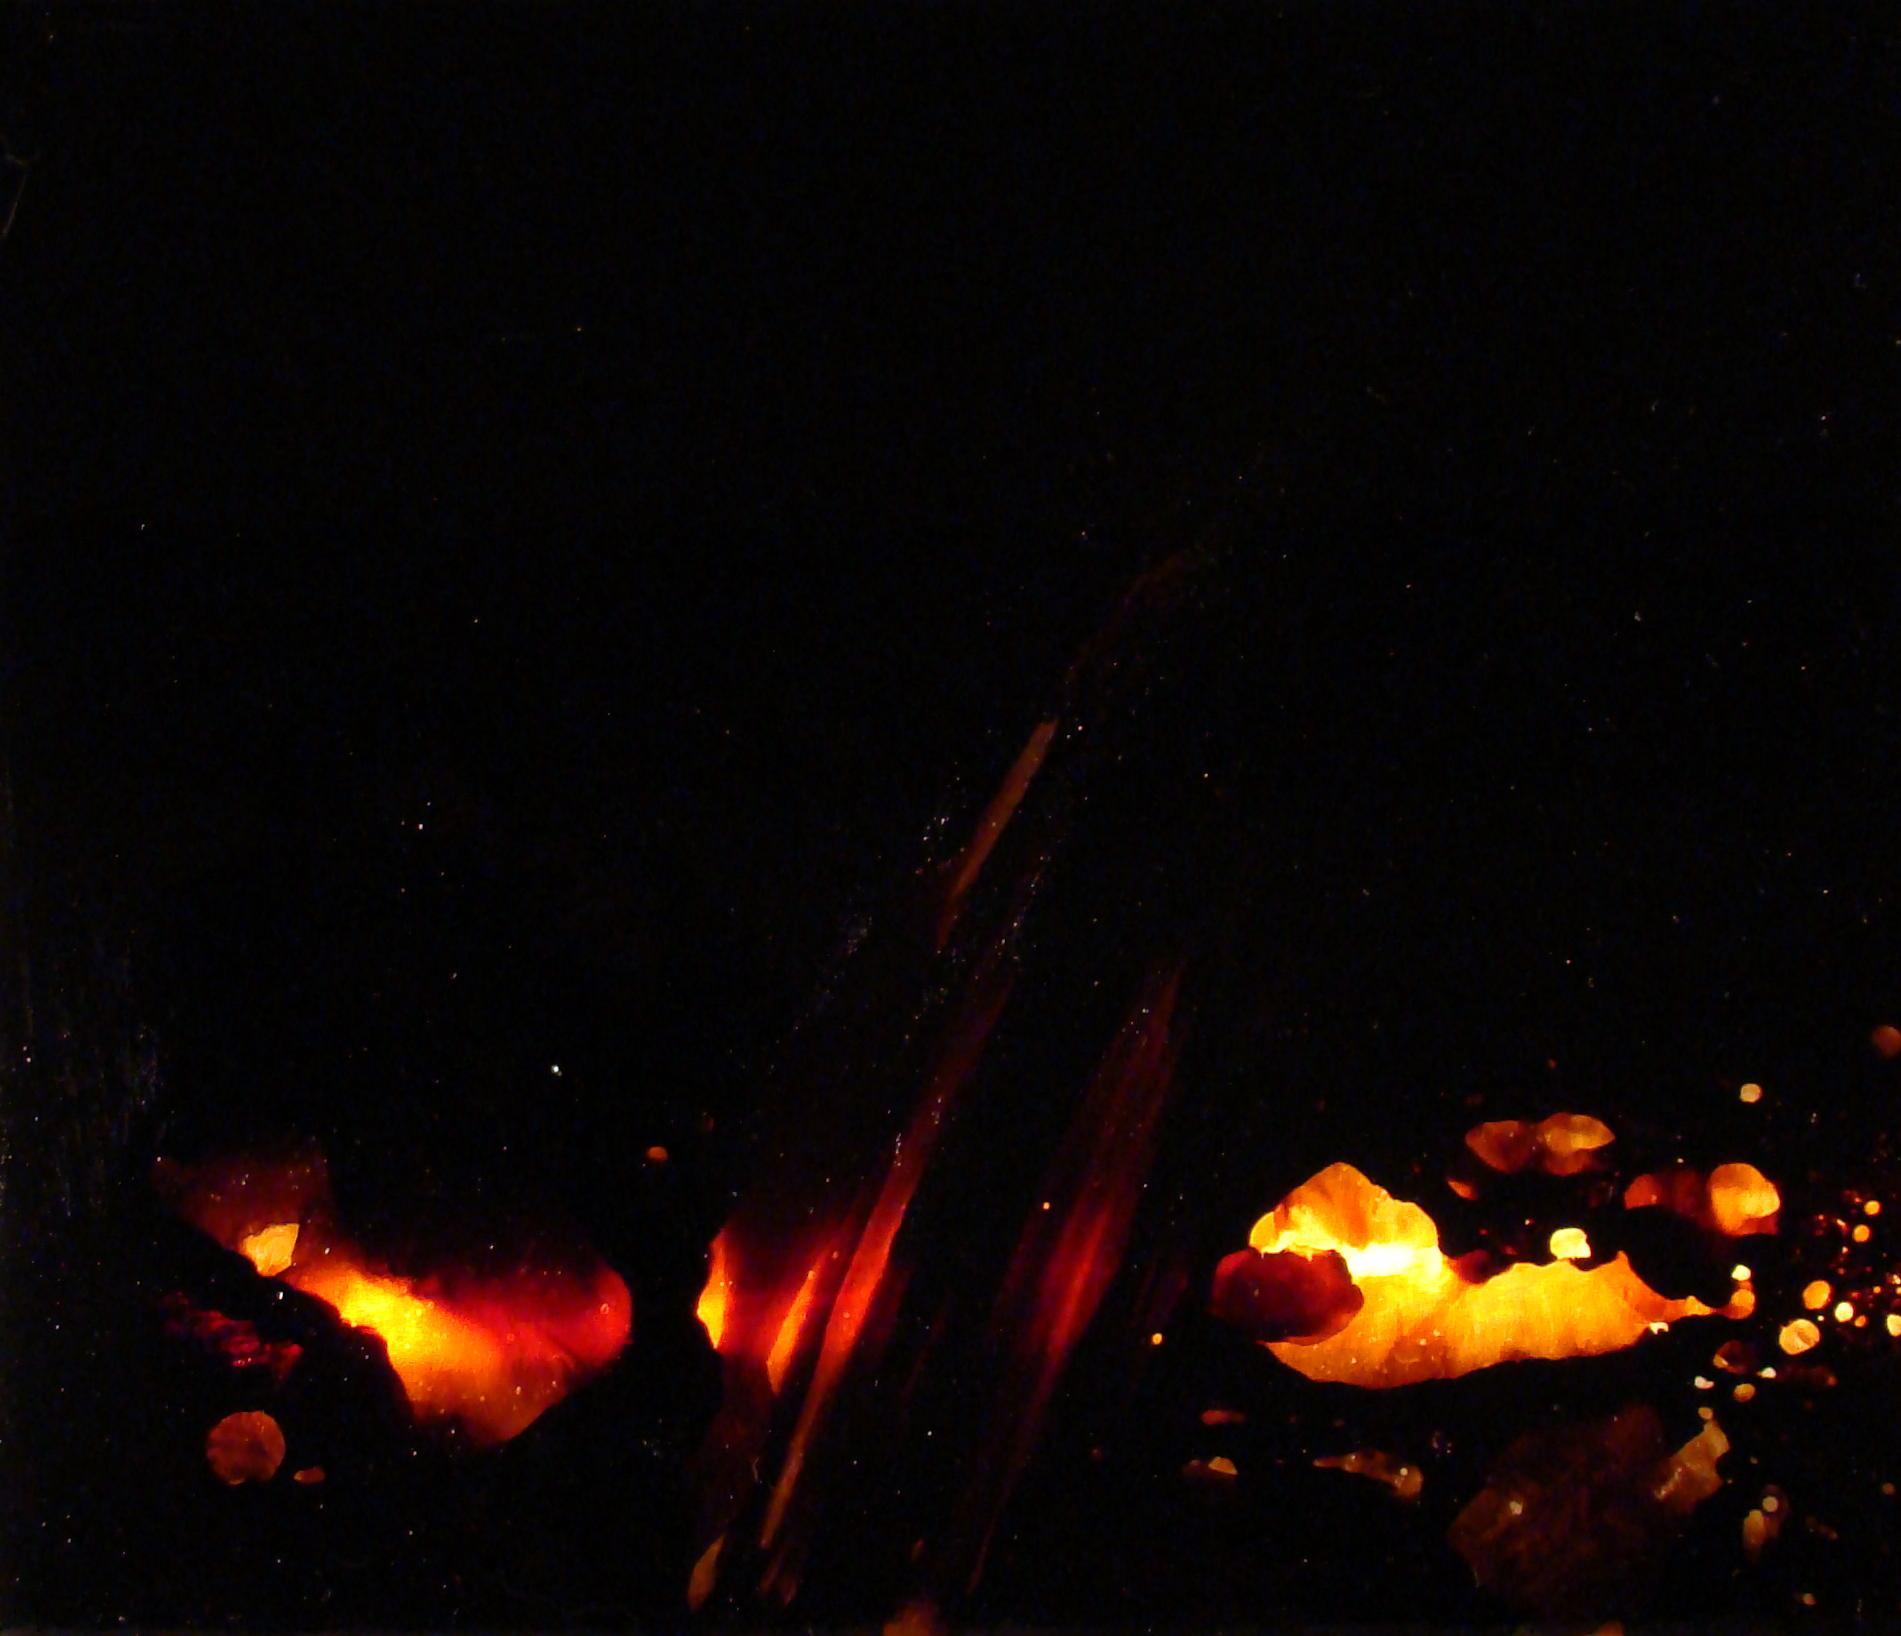 galop prèt du feu 58x66.JPG